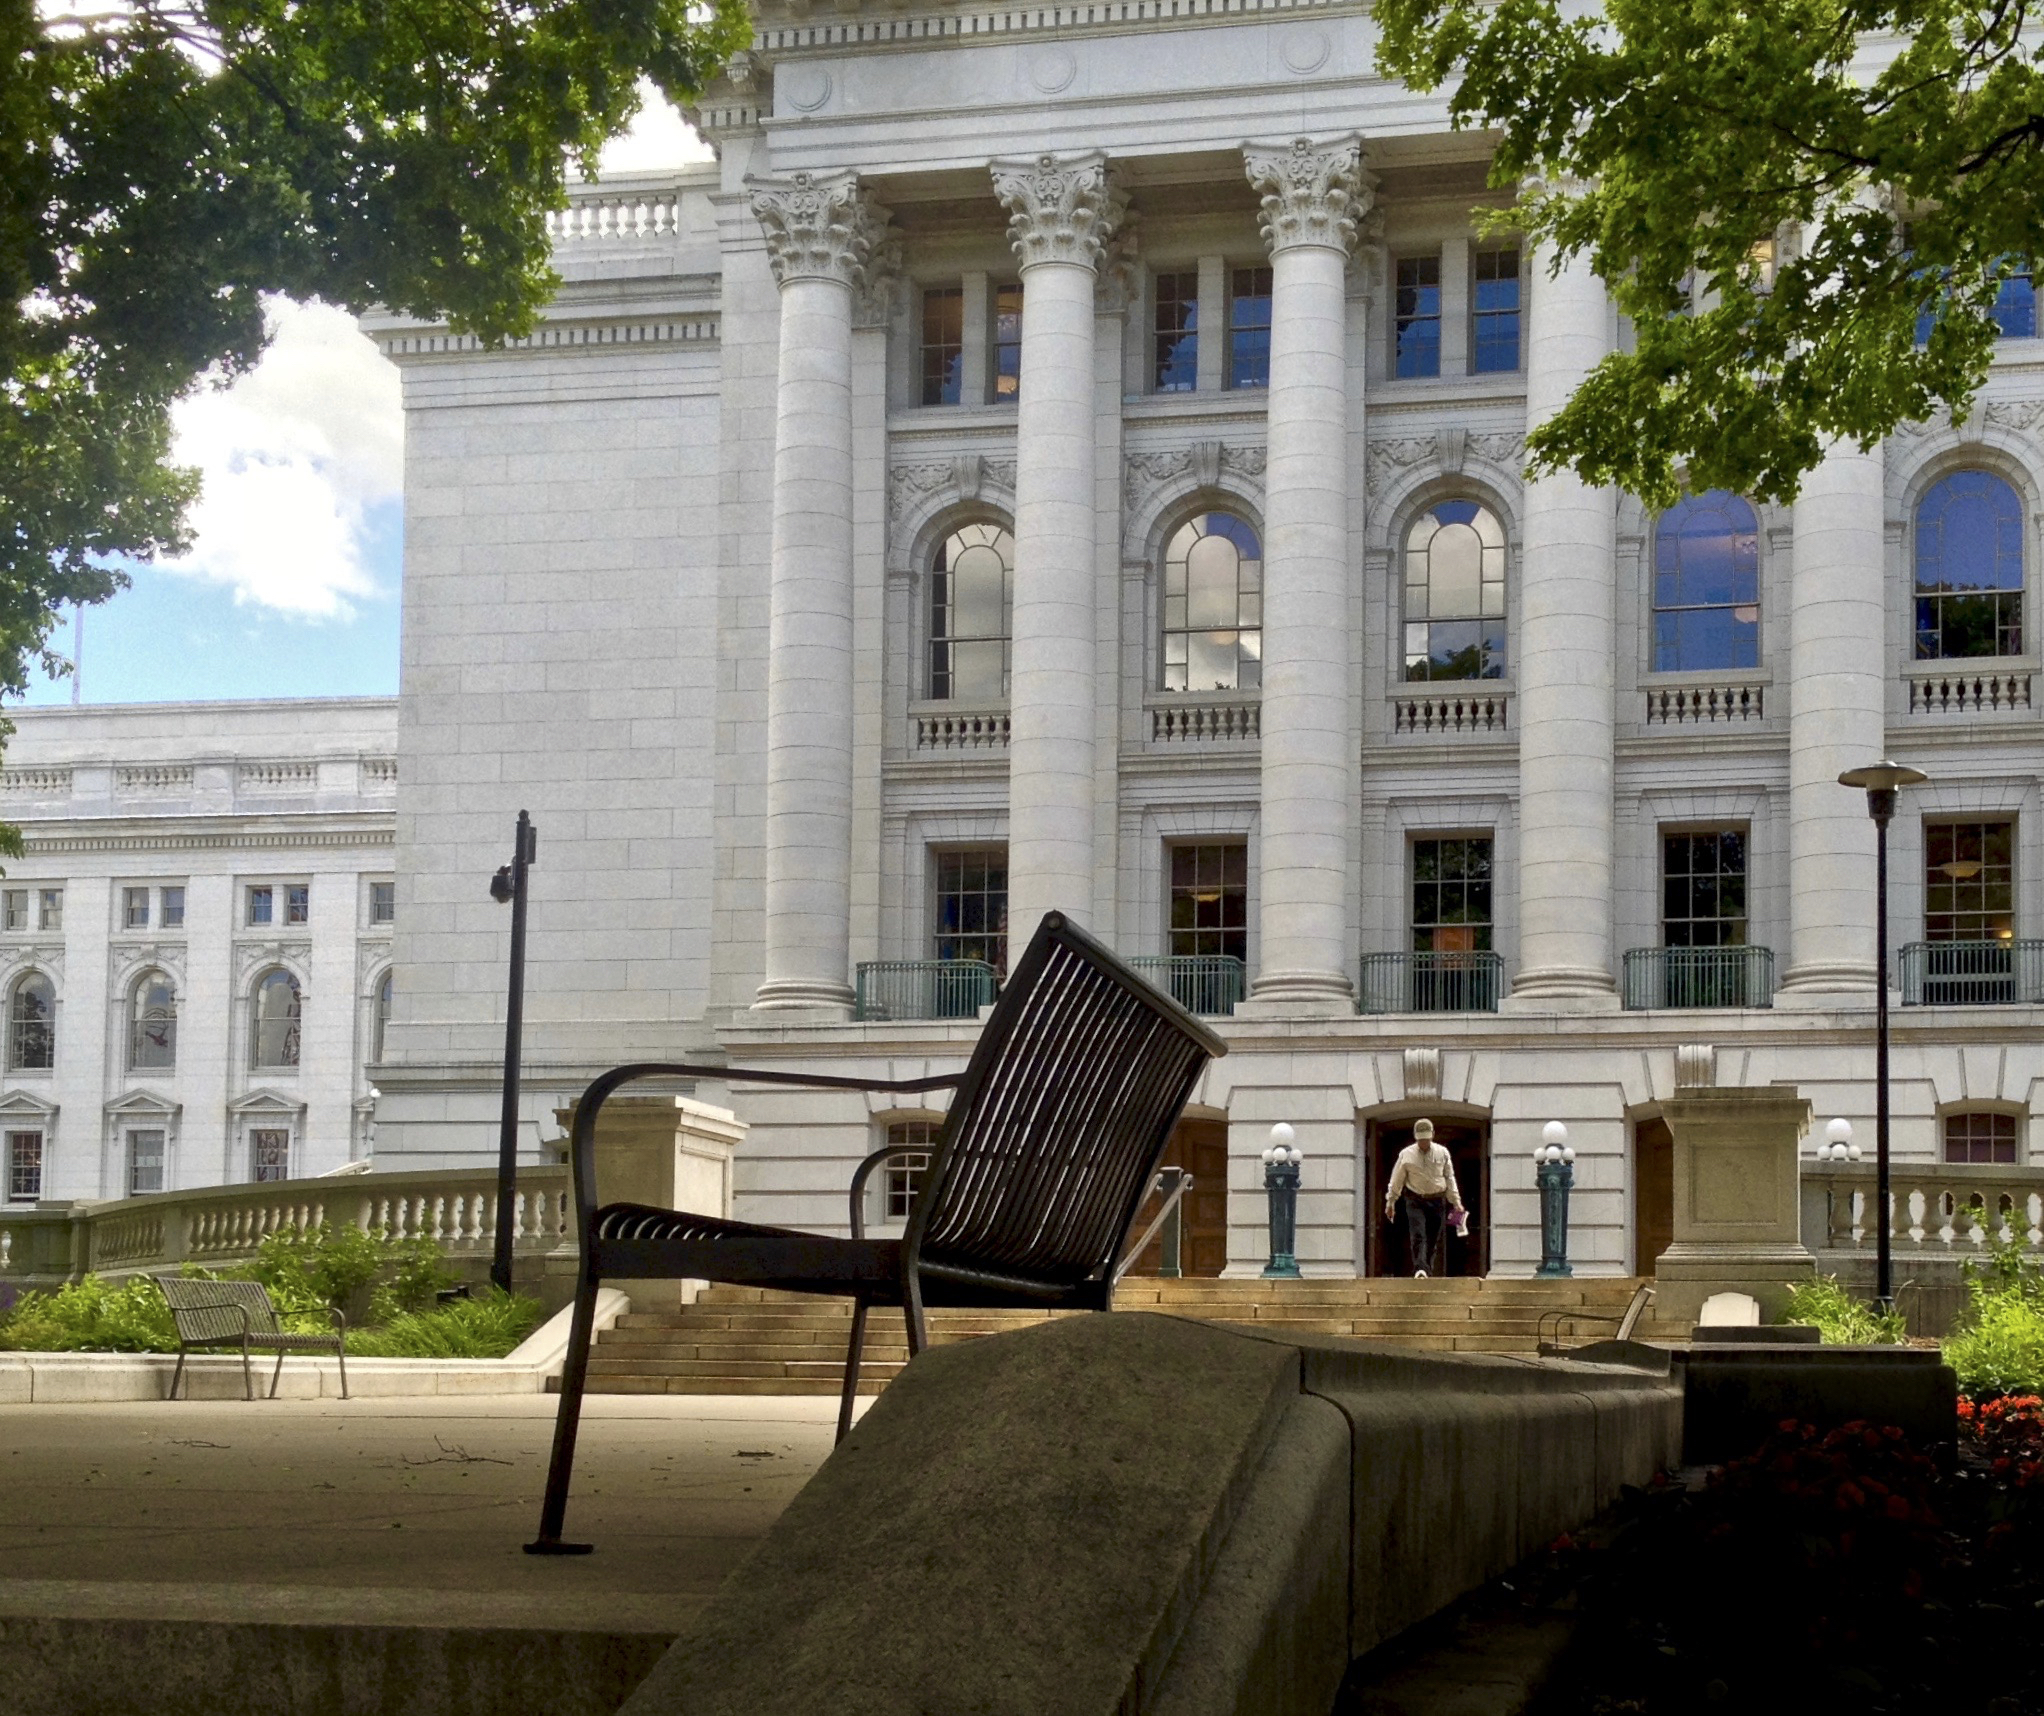 Windows. State Capitol. Madison, Wisconsin. June 2016. © William D. Walker